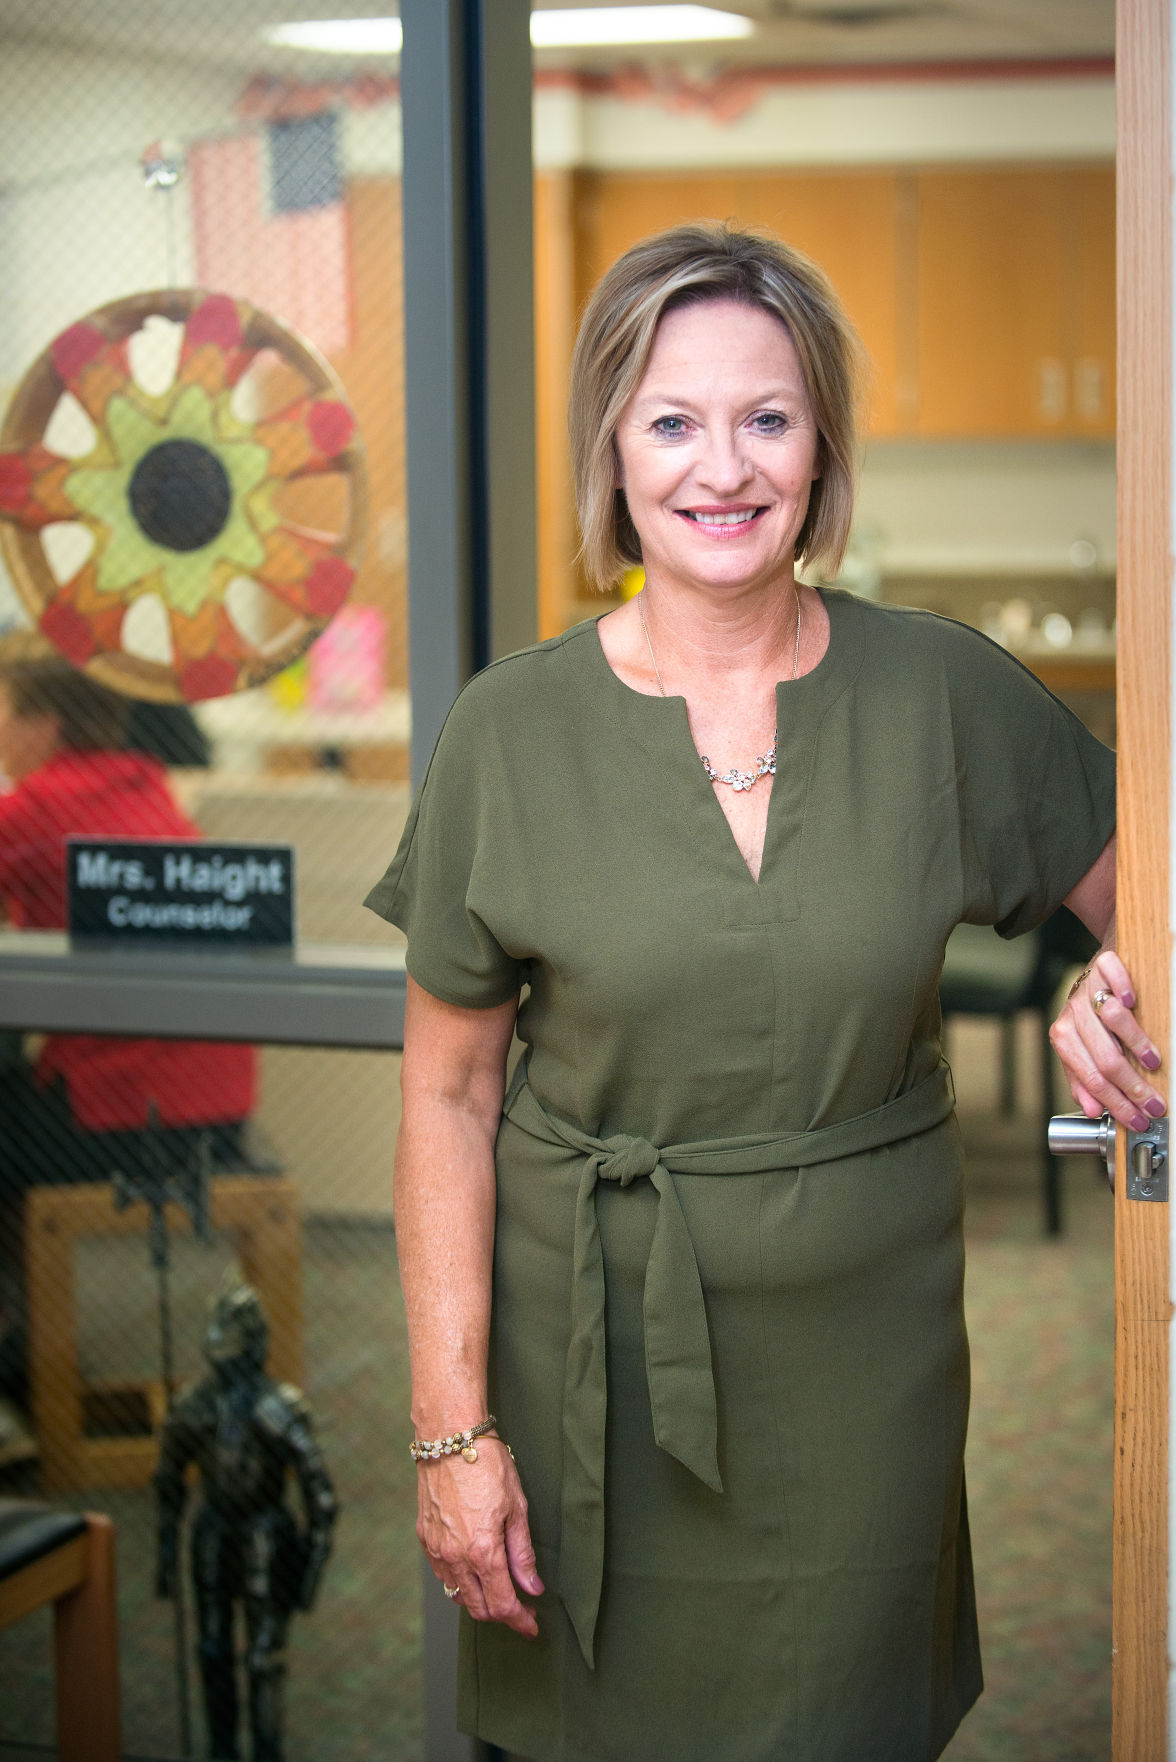 School Counselor Gail Haight